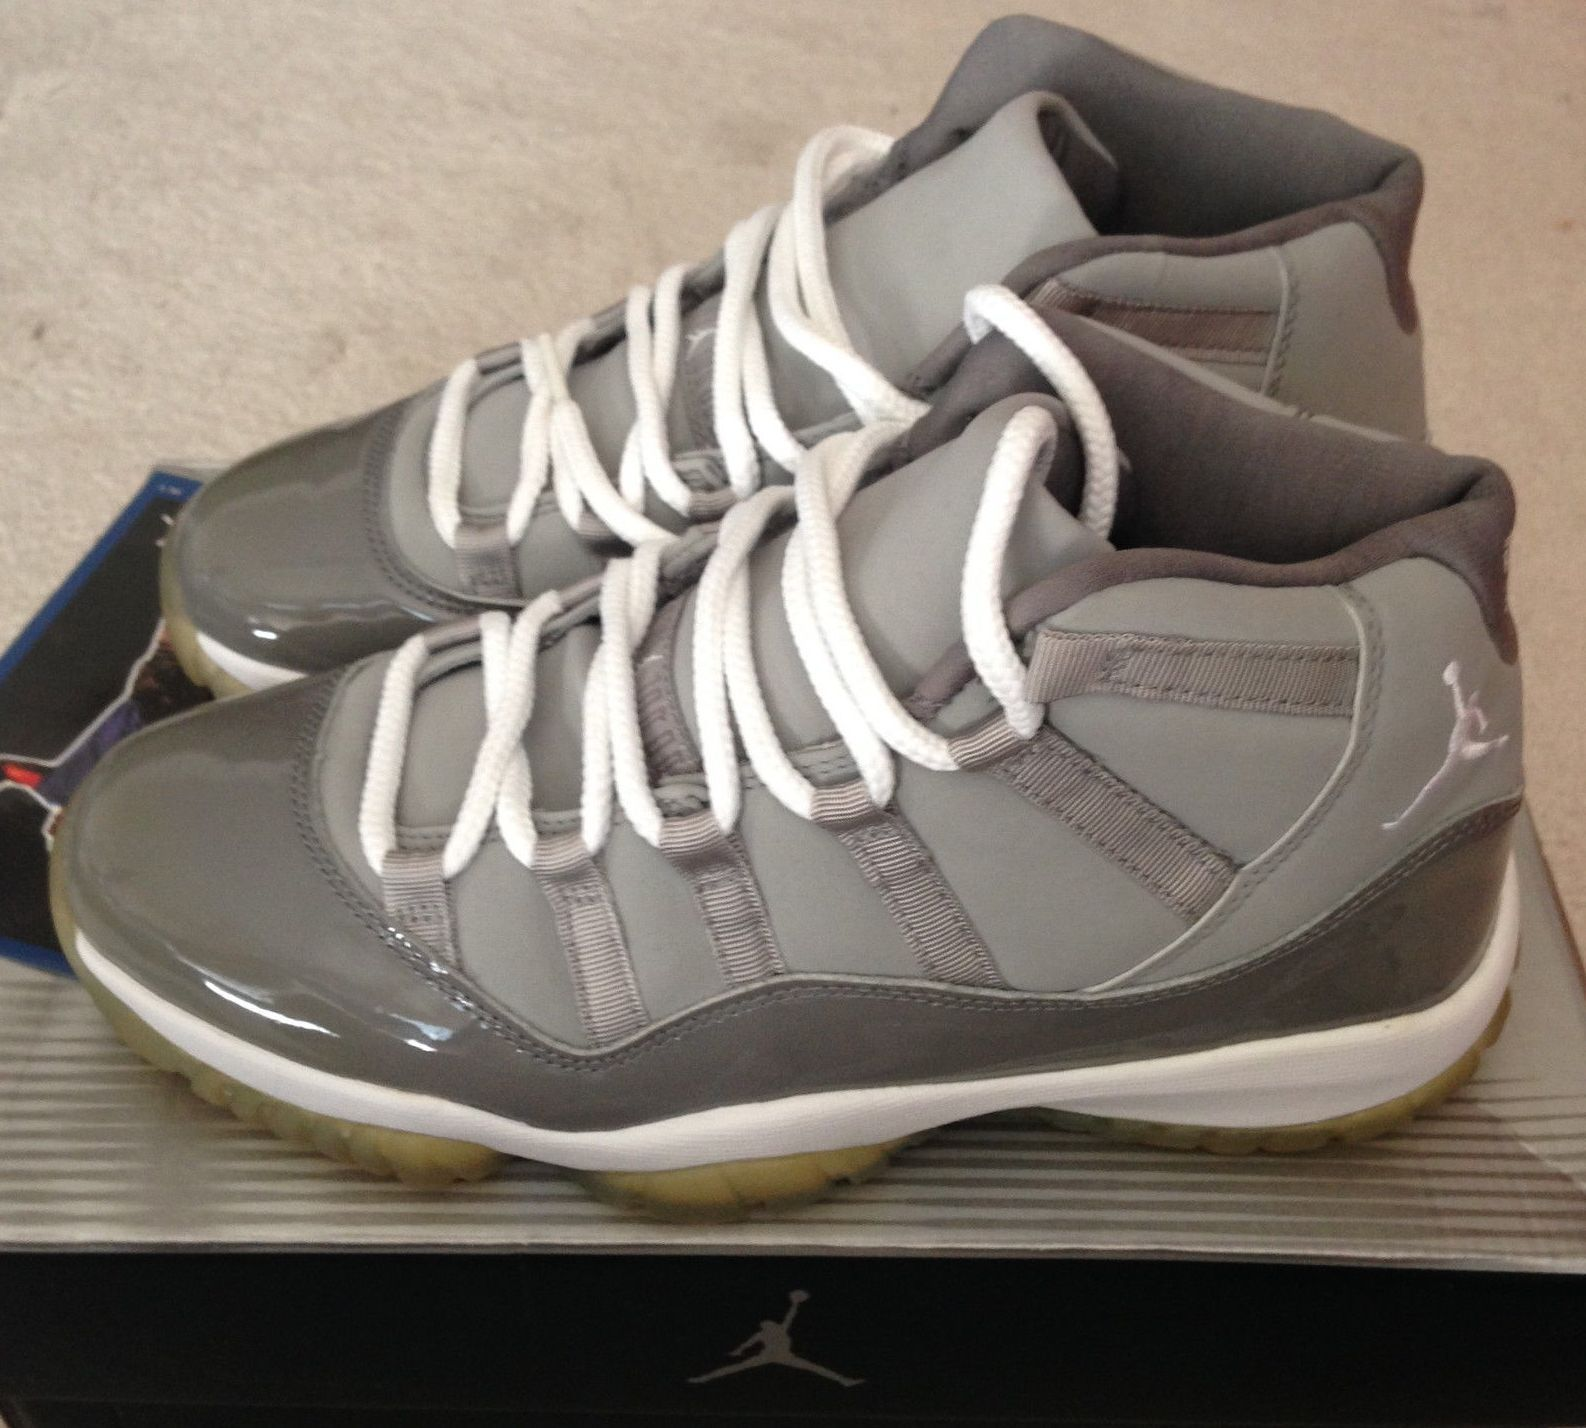 56008301c9726 Nike air jordans · DS 2001 Nike Air Jordan Retro XI 11 Cool Grey Size 8.5 136046  011